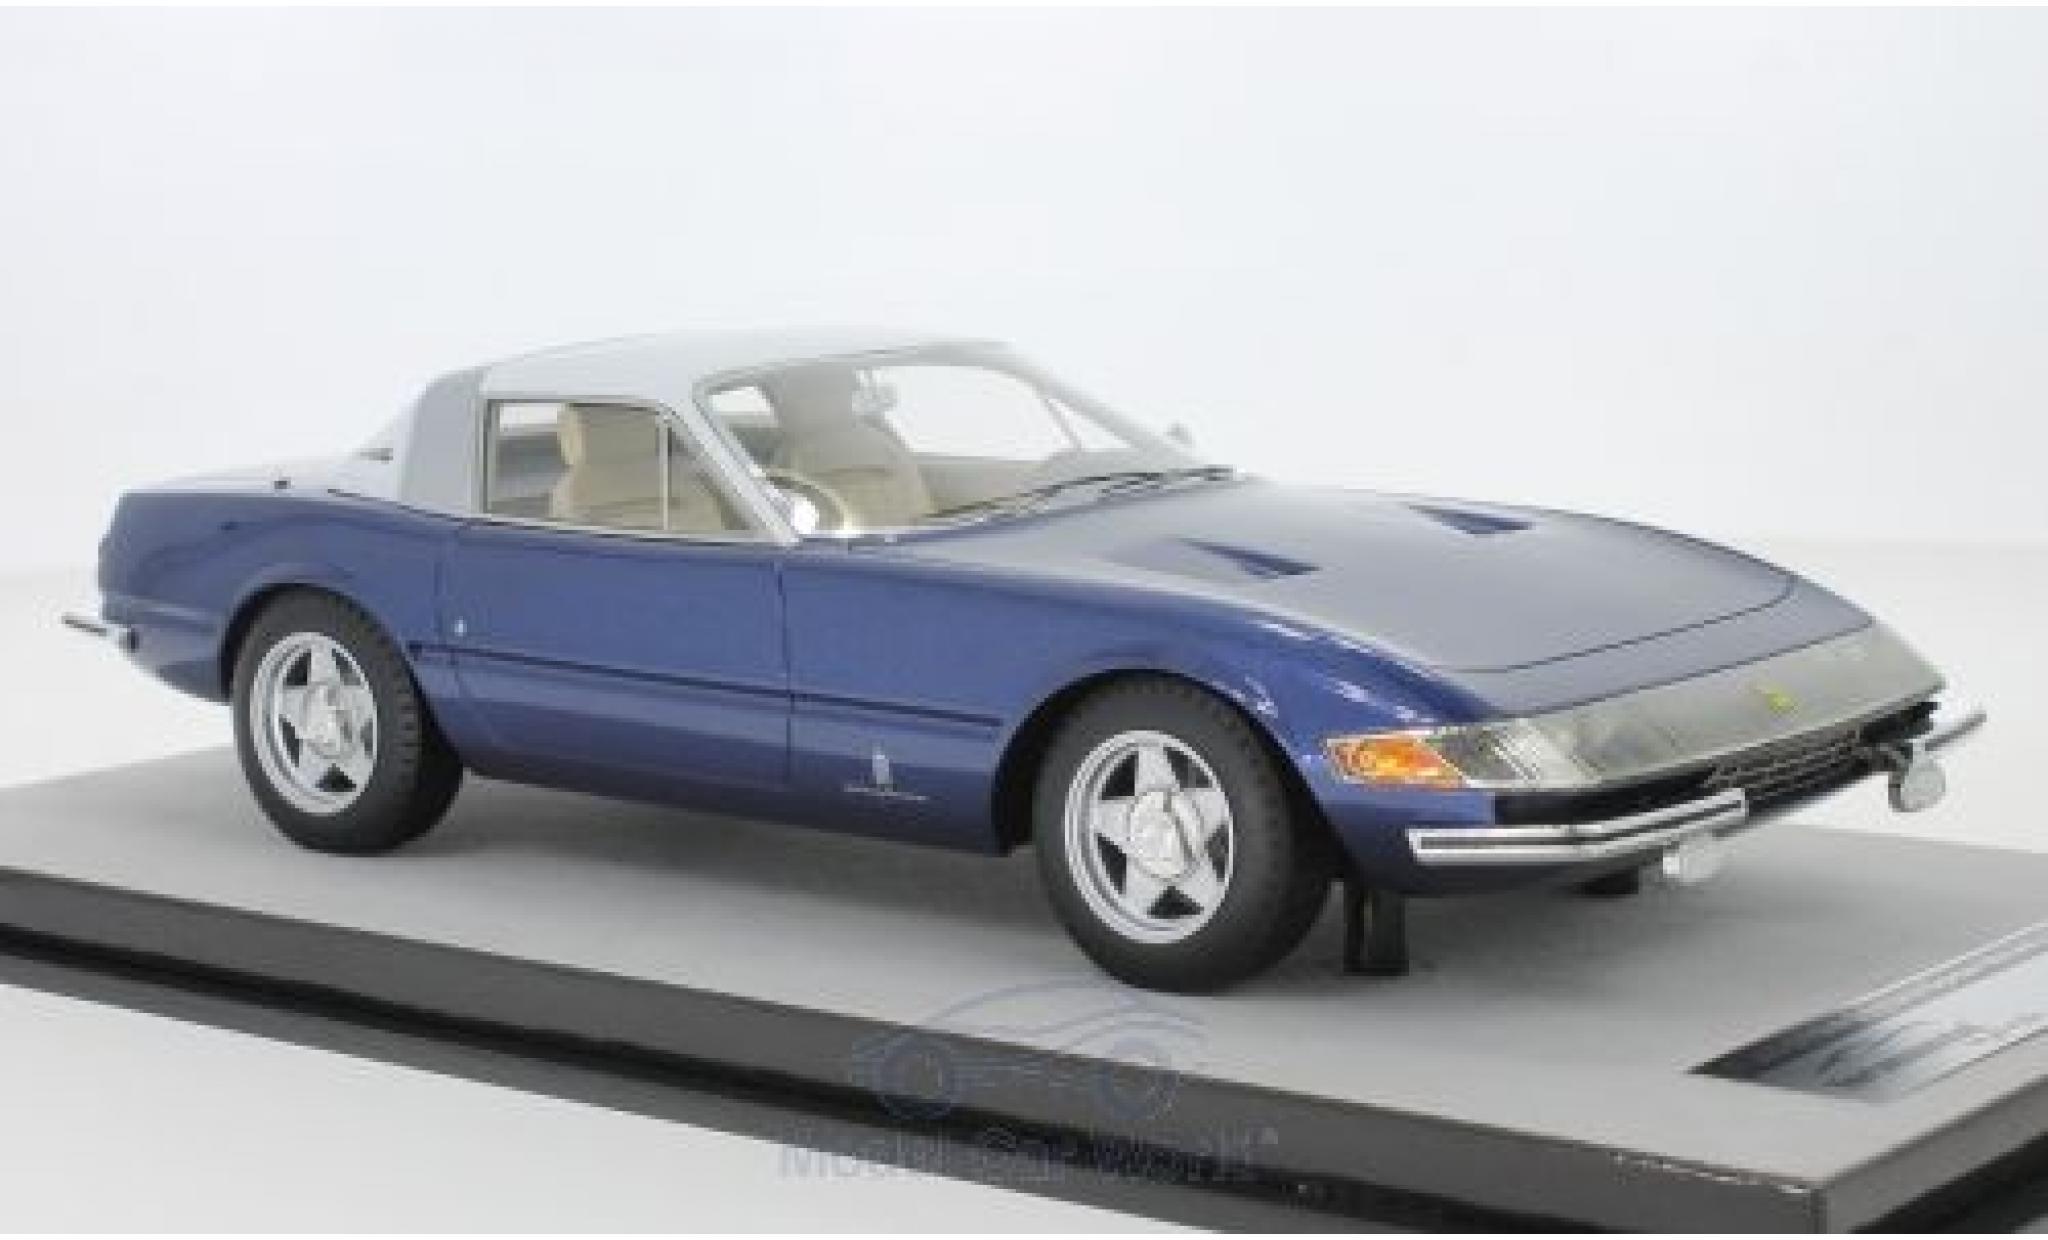 Ferrari 365 1/18 Tecnomodel GTB/4 Daytona Coupe Speciale métallisé bleue/blanche 1969